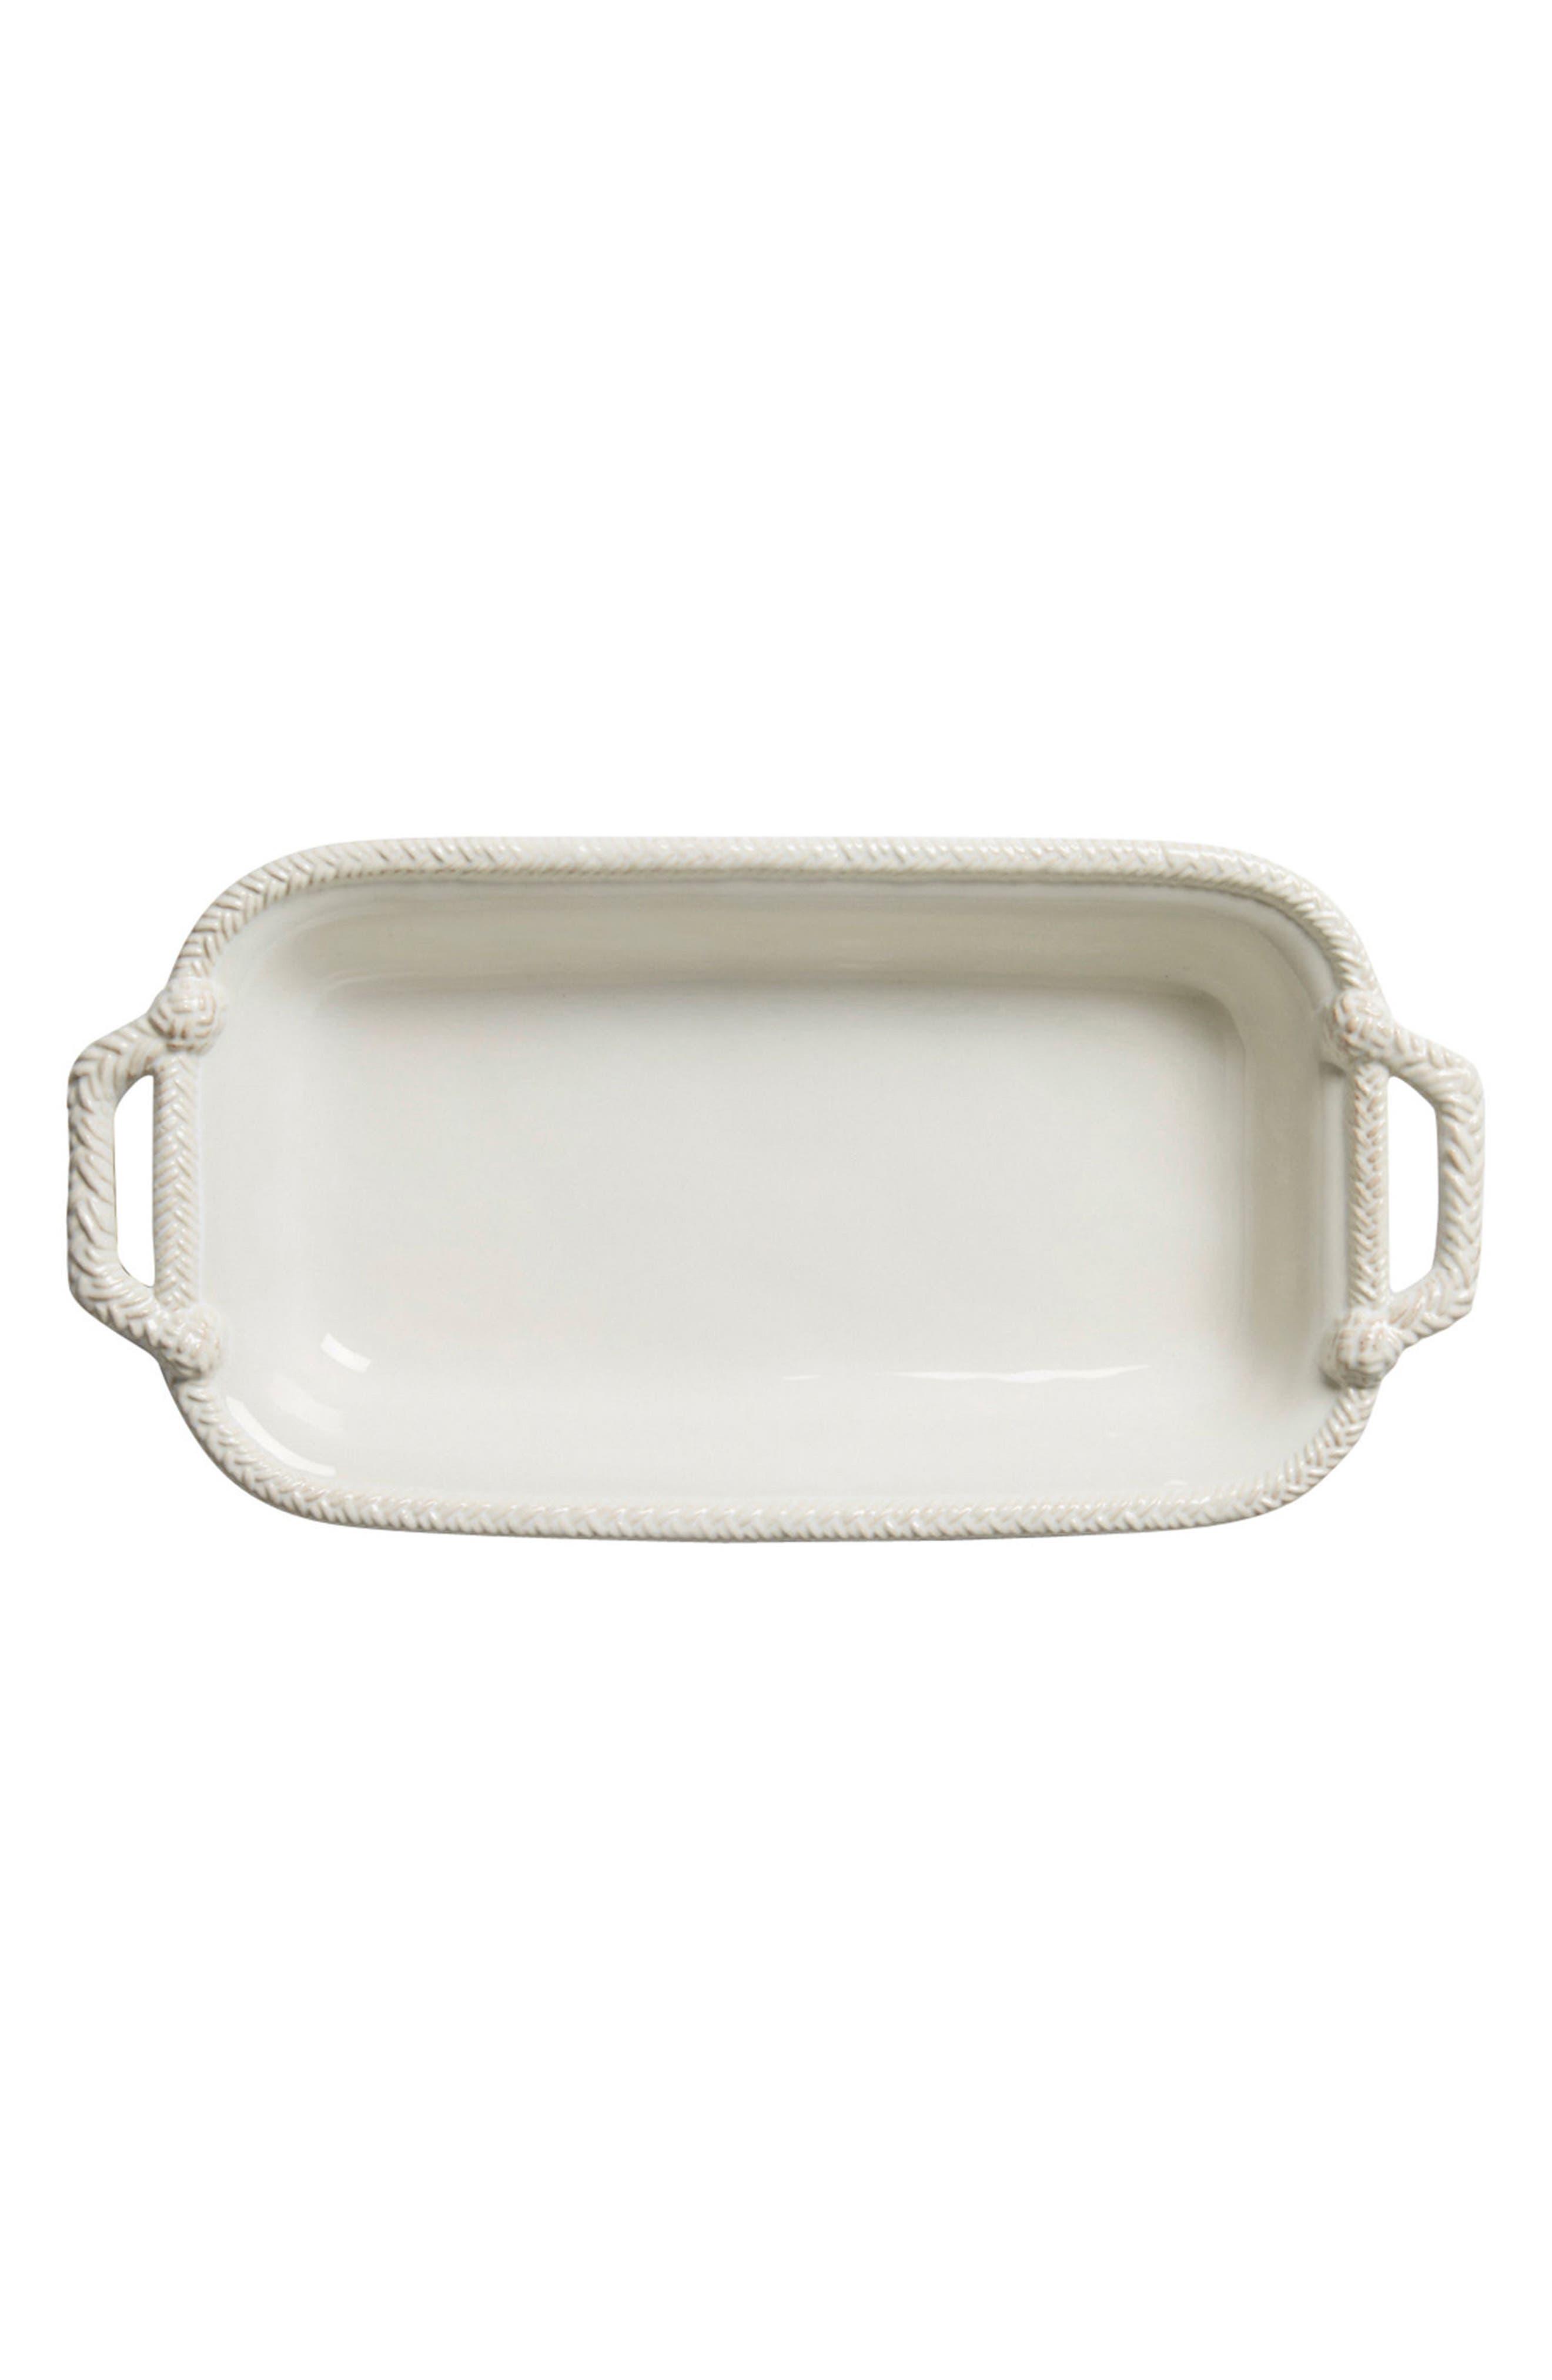 Juliska Le Panier 1.5-Quart Rectangular Baking Dish